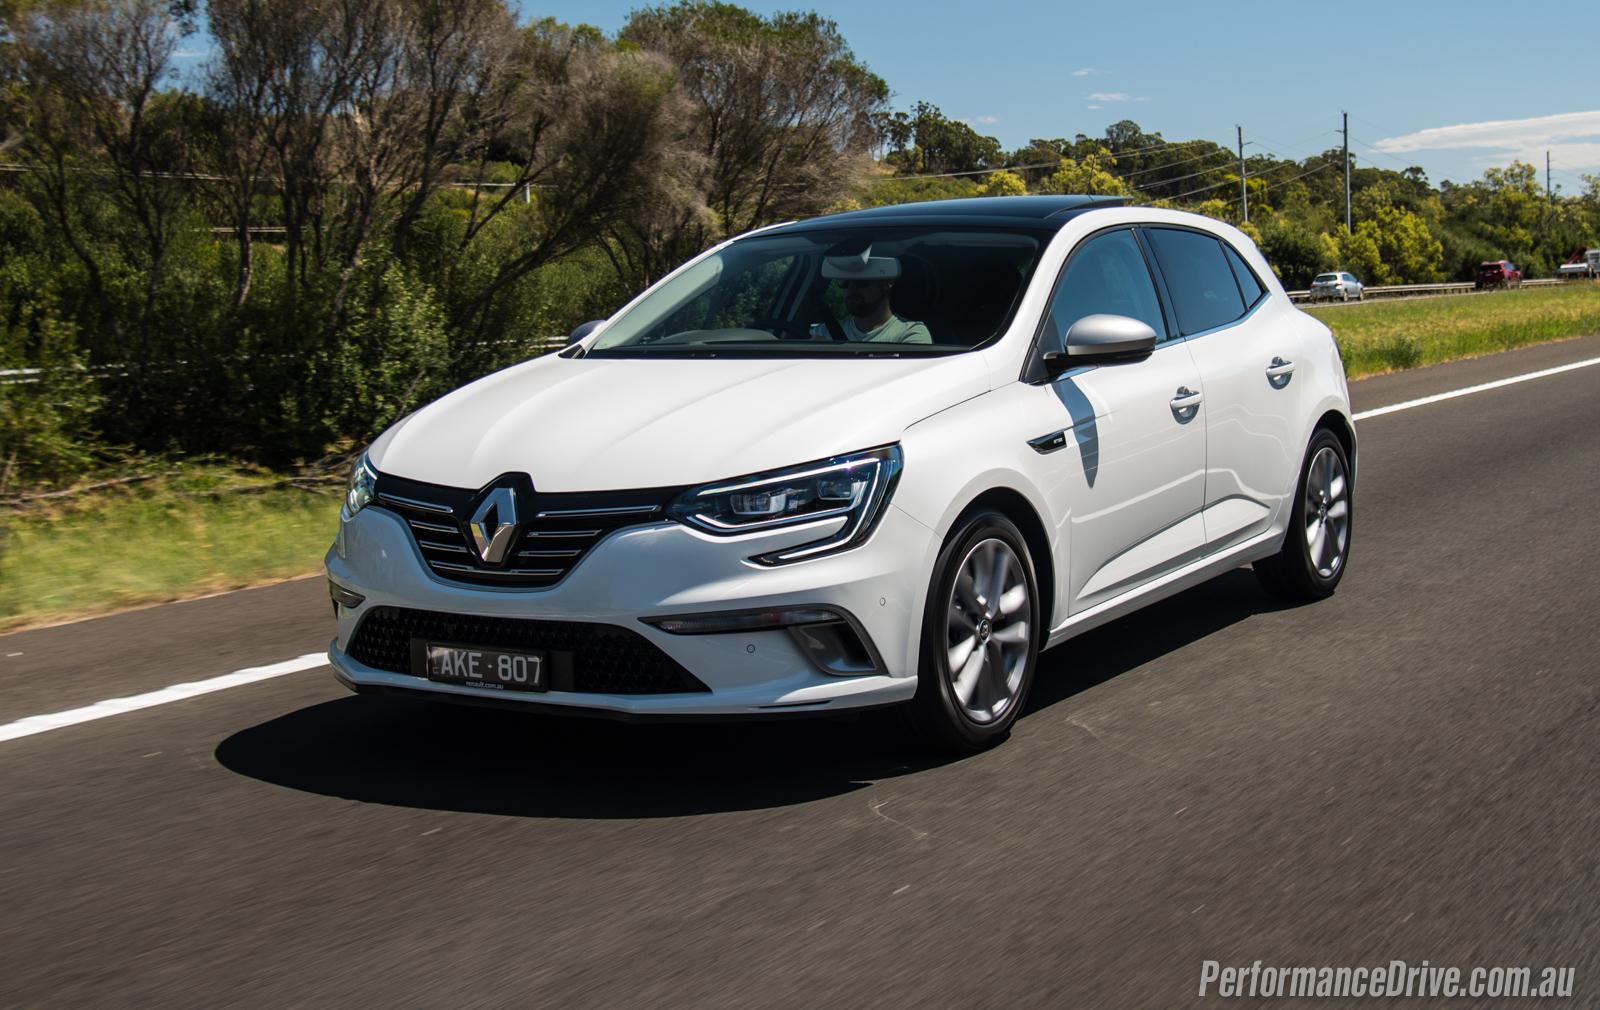 2017 Renault Megane Gt Line 1 2t Review Video